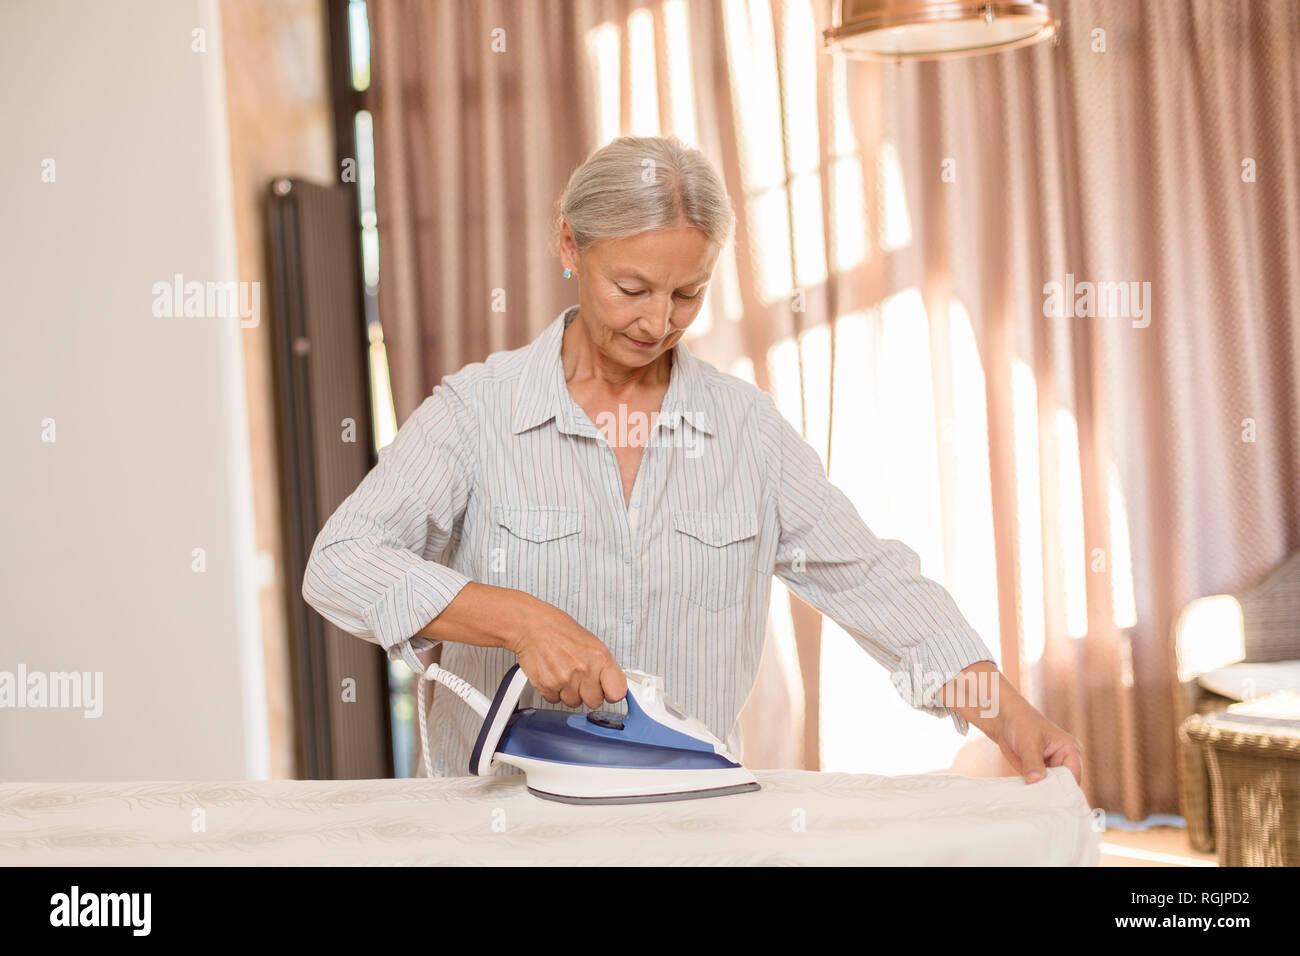 Senior woman ironing - Stock Image